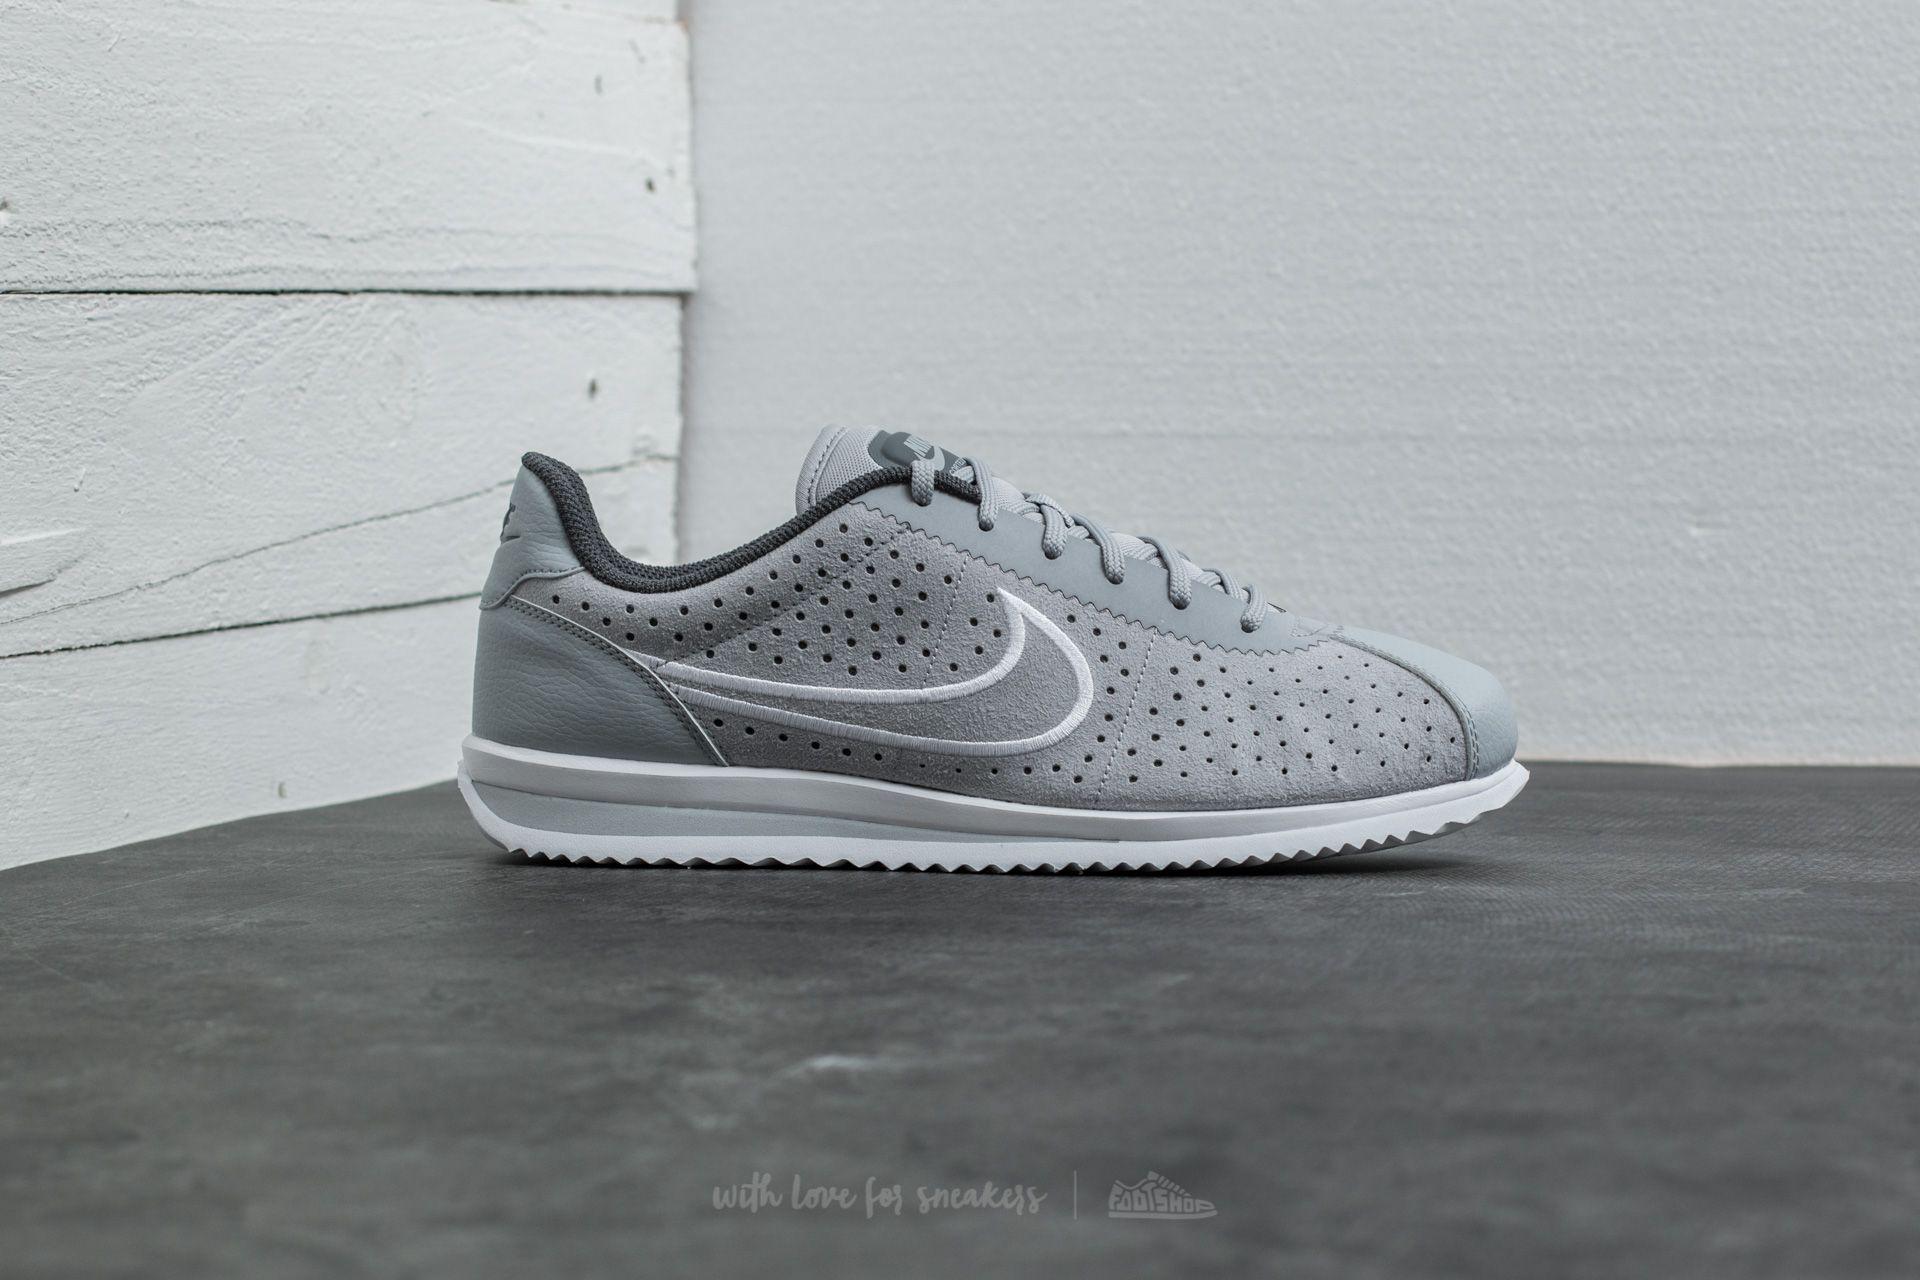 Lyst - Nike Cortez Ultra Moire 2 Wolf Grey  White-dark Grey in Gray ... 5c55e1df5